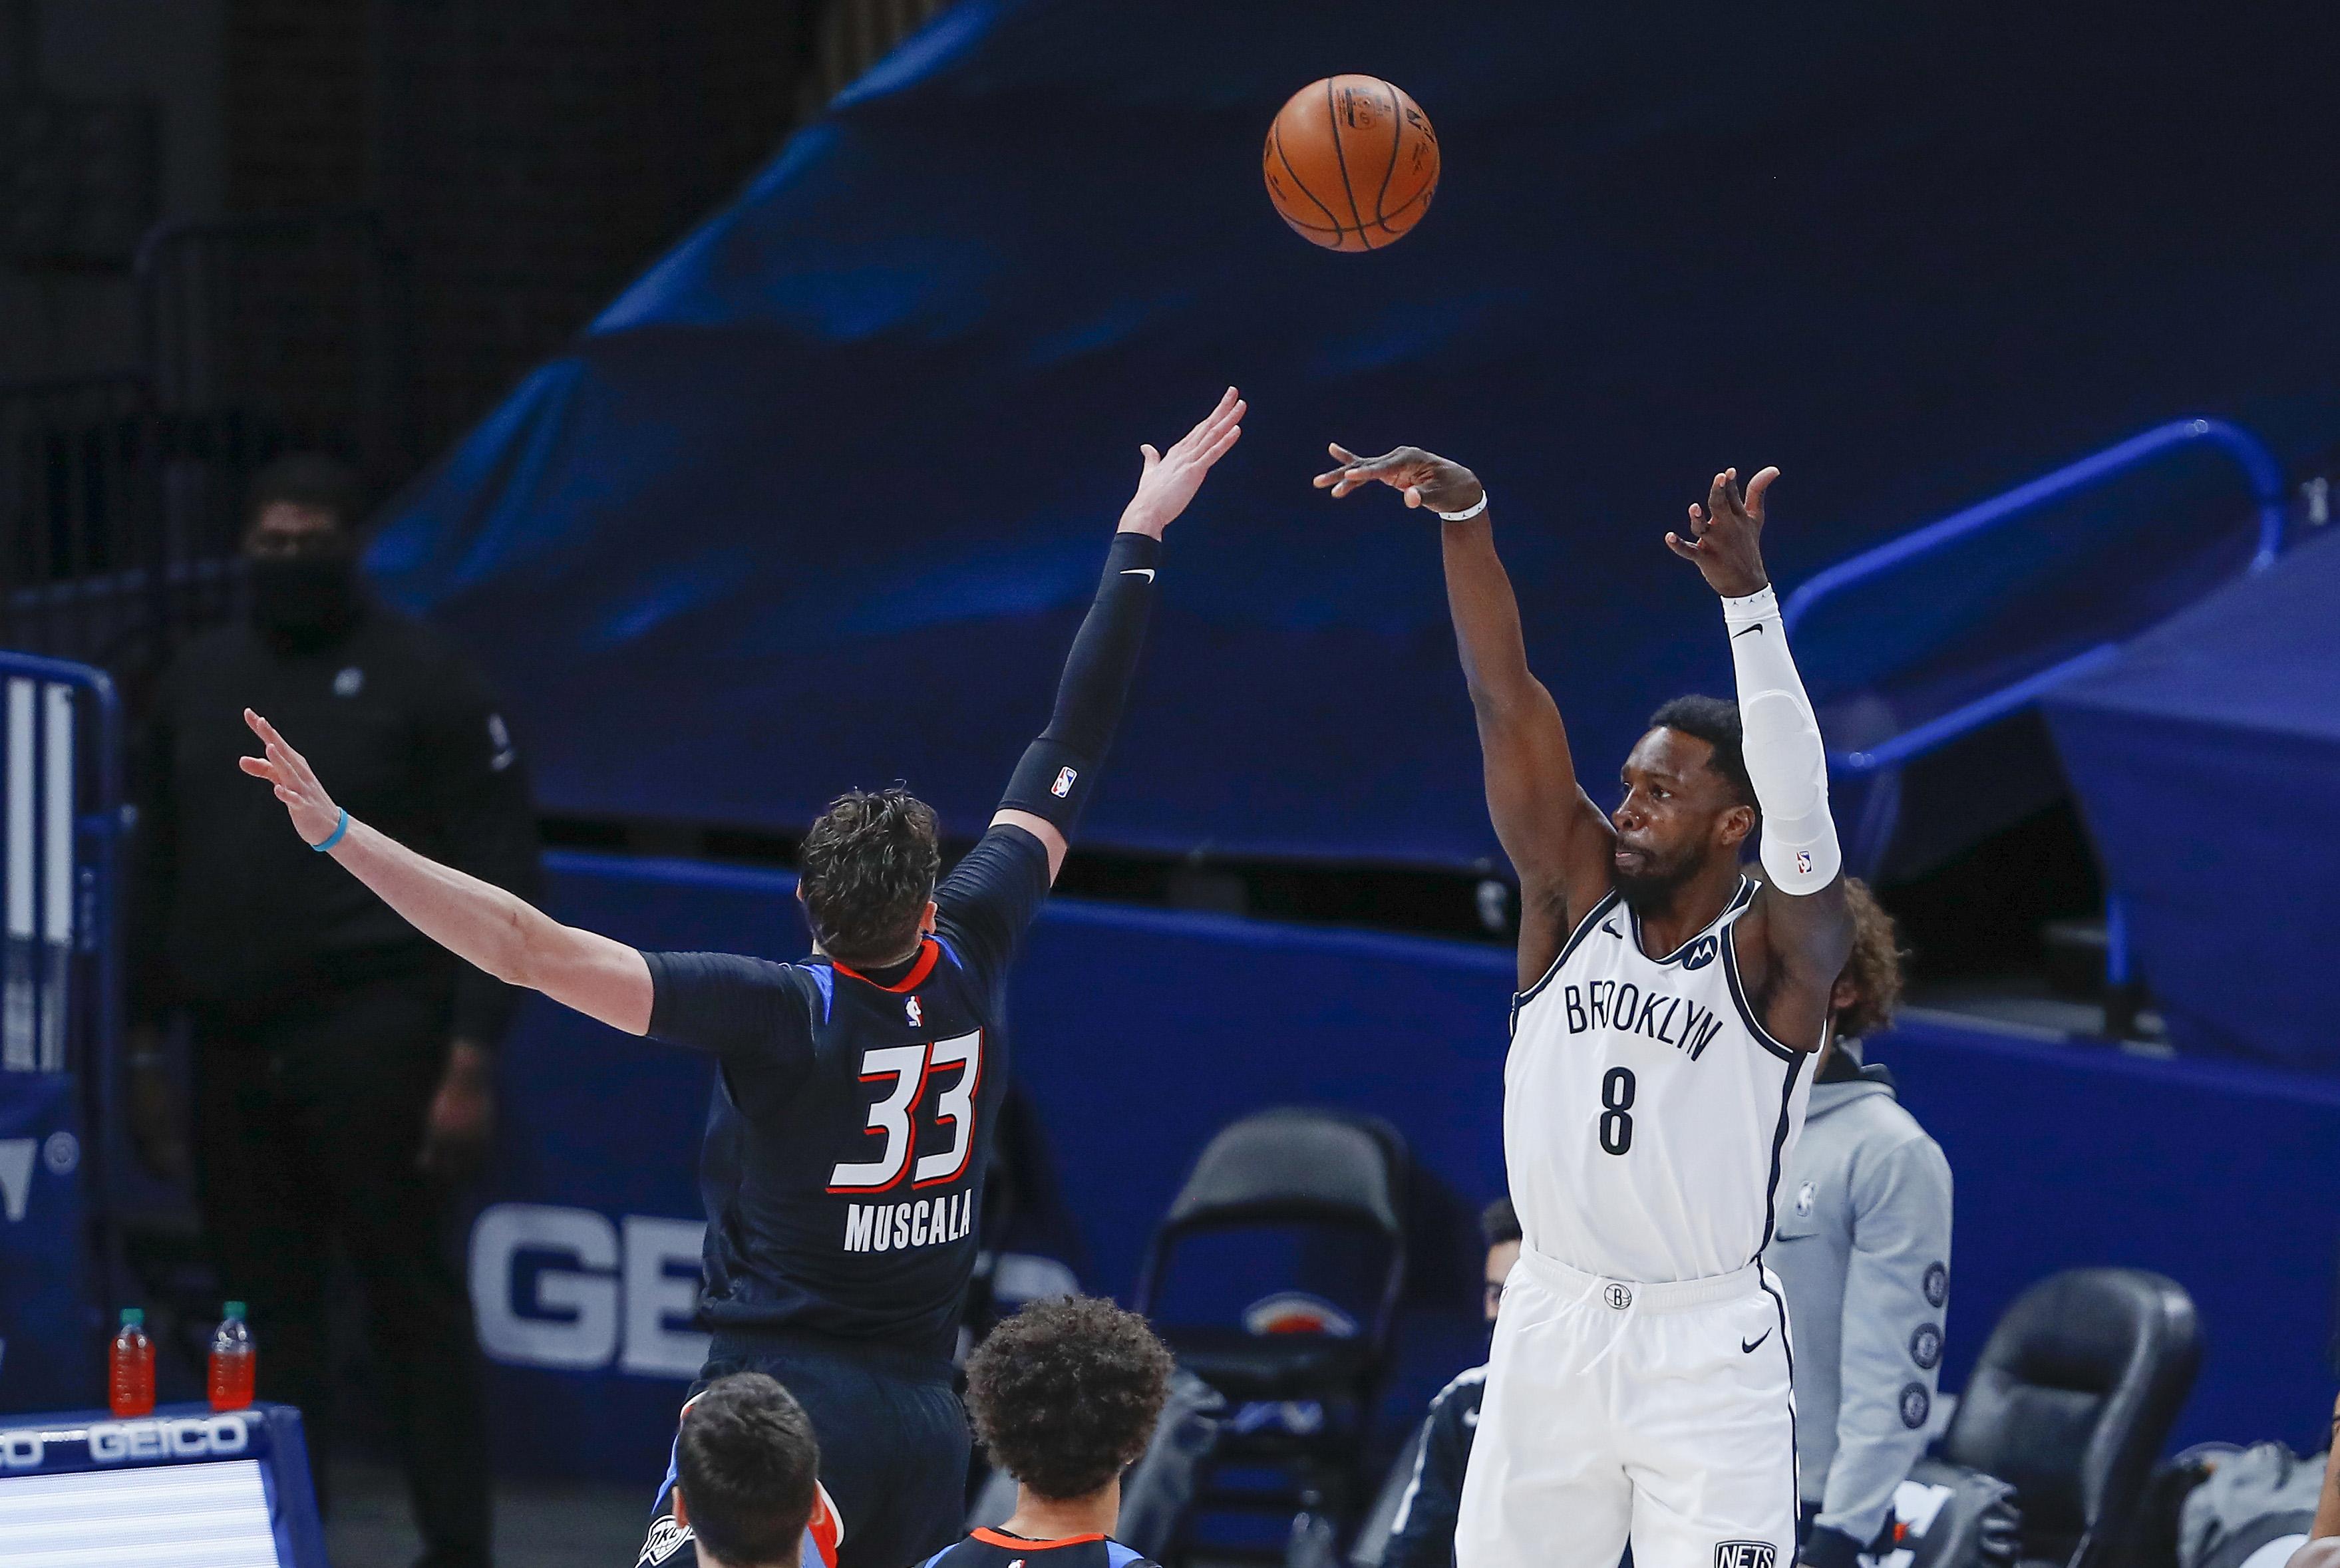 Jan 29, 2021; Oklahoma City, Oklahoma, USA; Brooklyn Nets forward Jeff Green (8) shoots a three point basket against Oklahoma City Thunder center Mike Muscala (33) during the first half at Chesapeake Energy Arena.